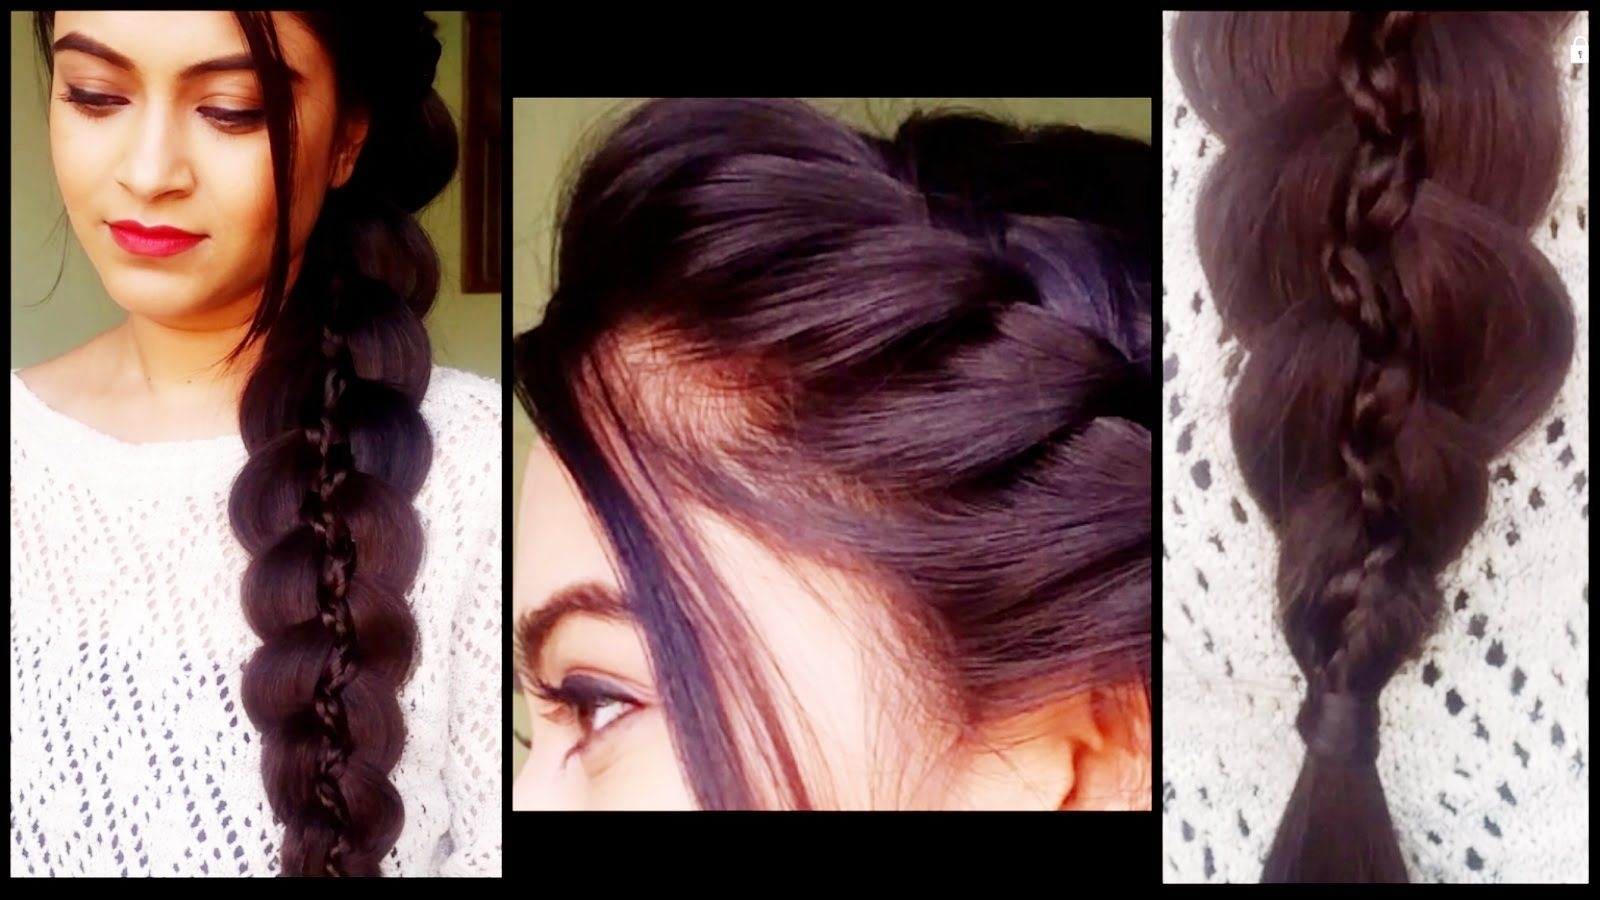 Braided 5 Strand Braid - Hairstyles For Medium/long Hair in Indian Hairstyles For Long Hair